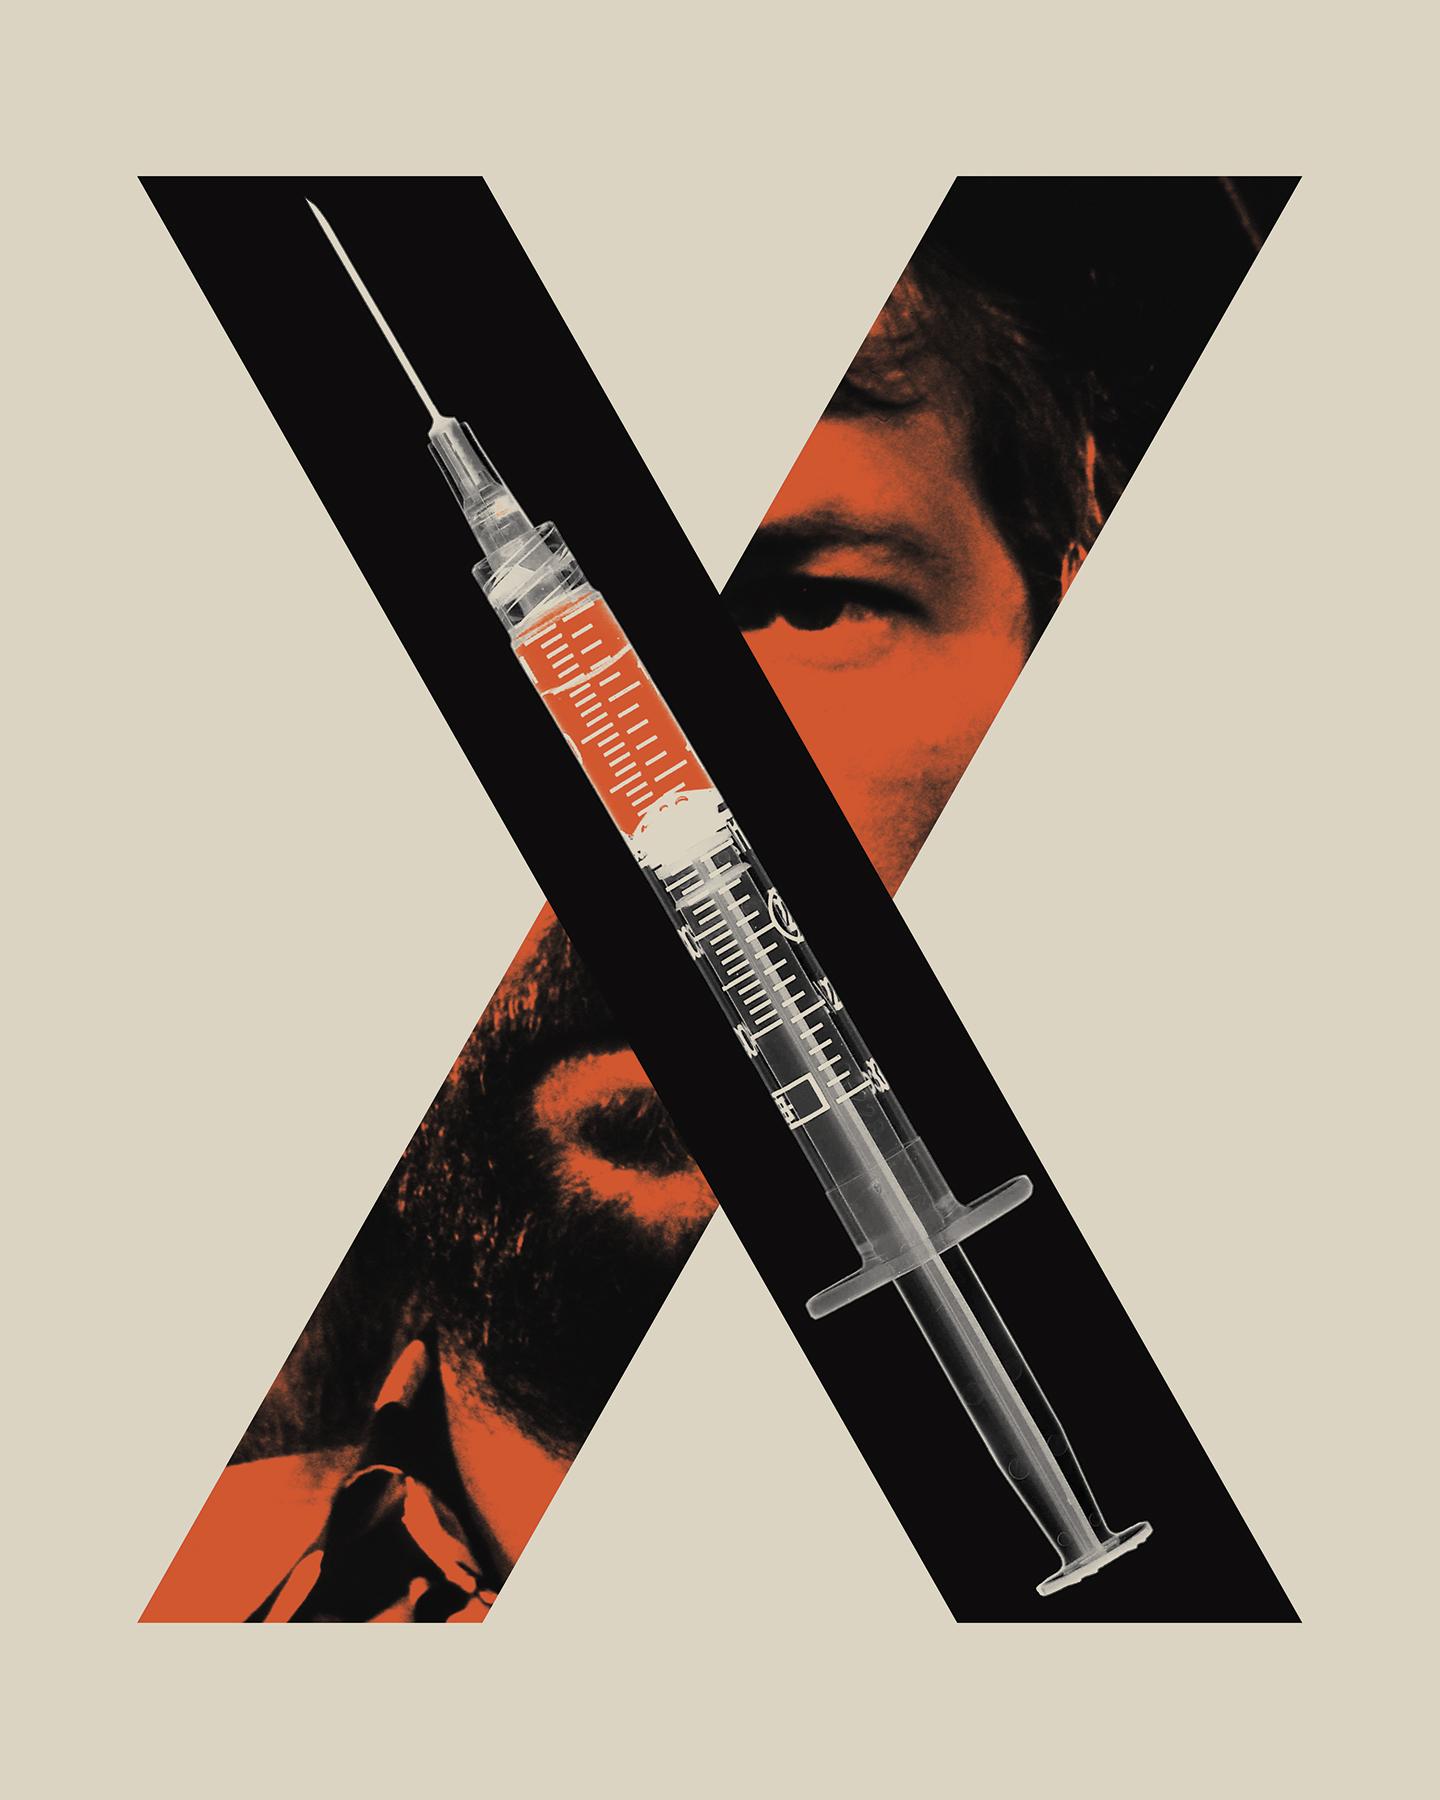 Eric Clapton Isn't Just Spouting Vaccine Nonsense—He's Bankrolling It